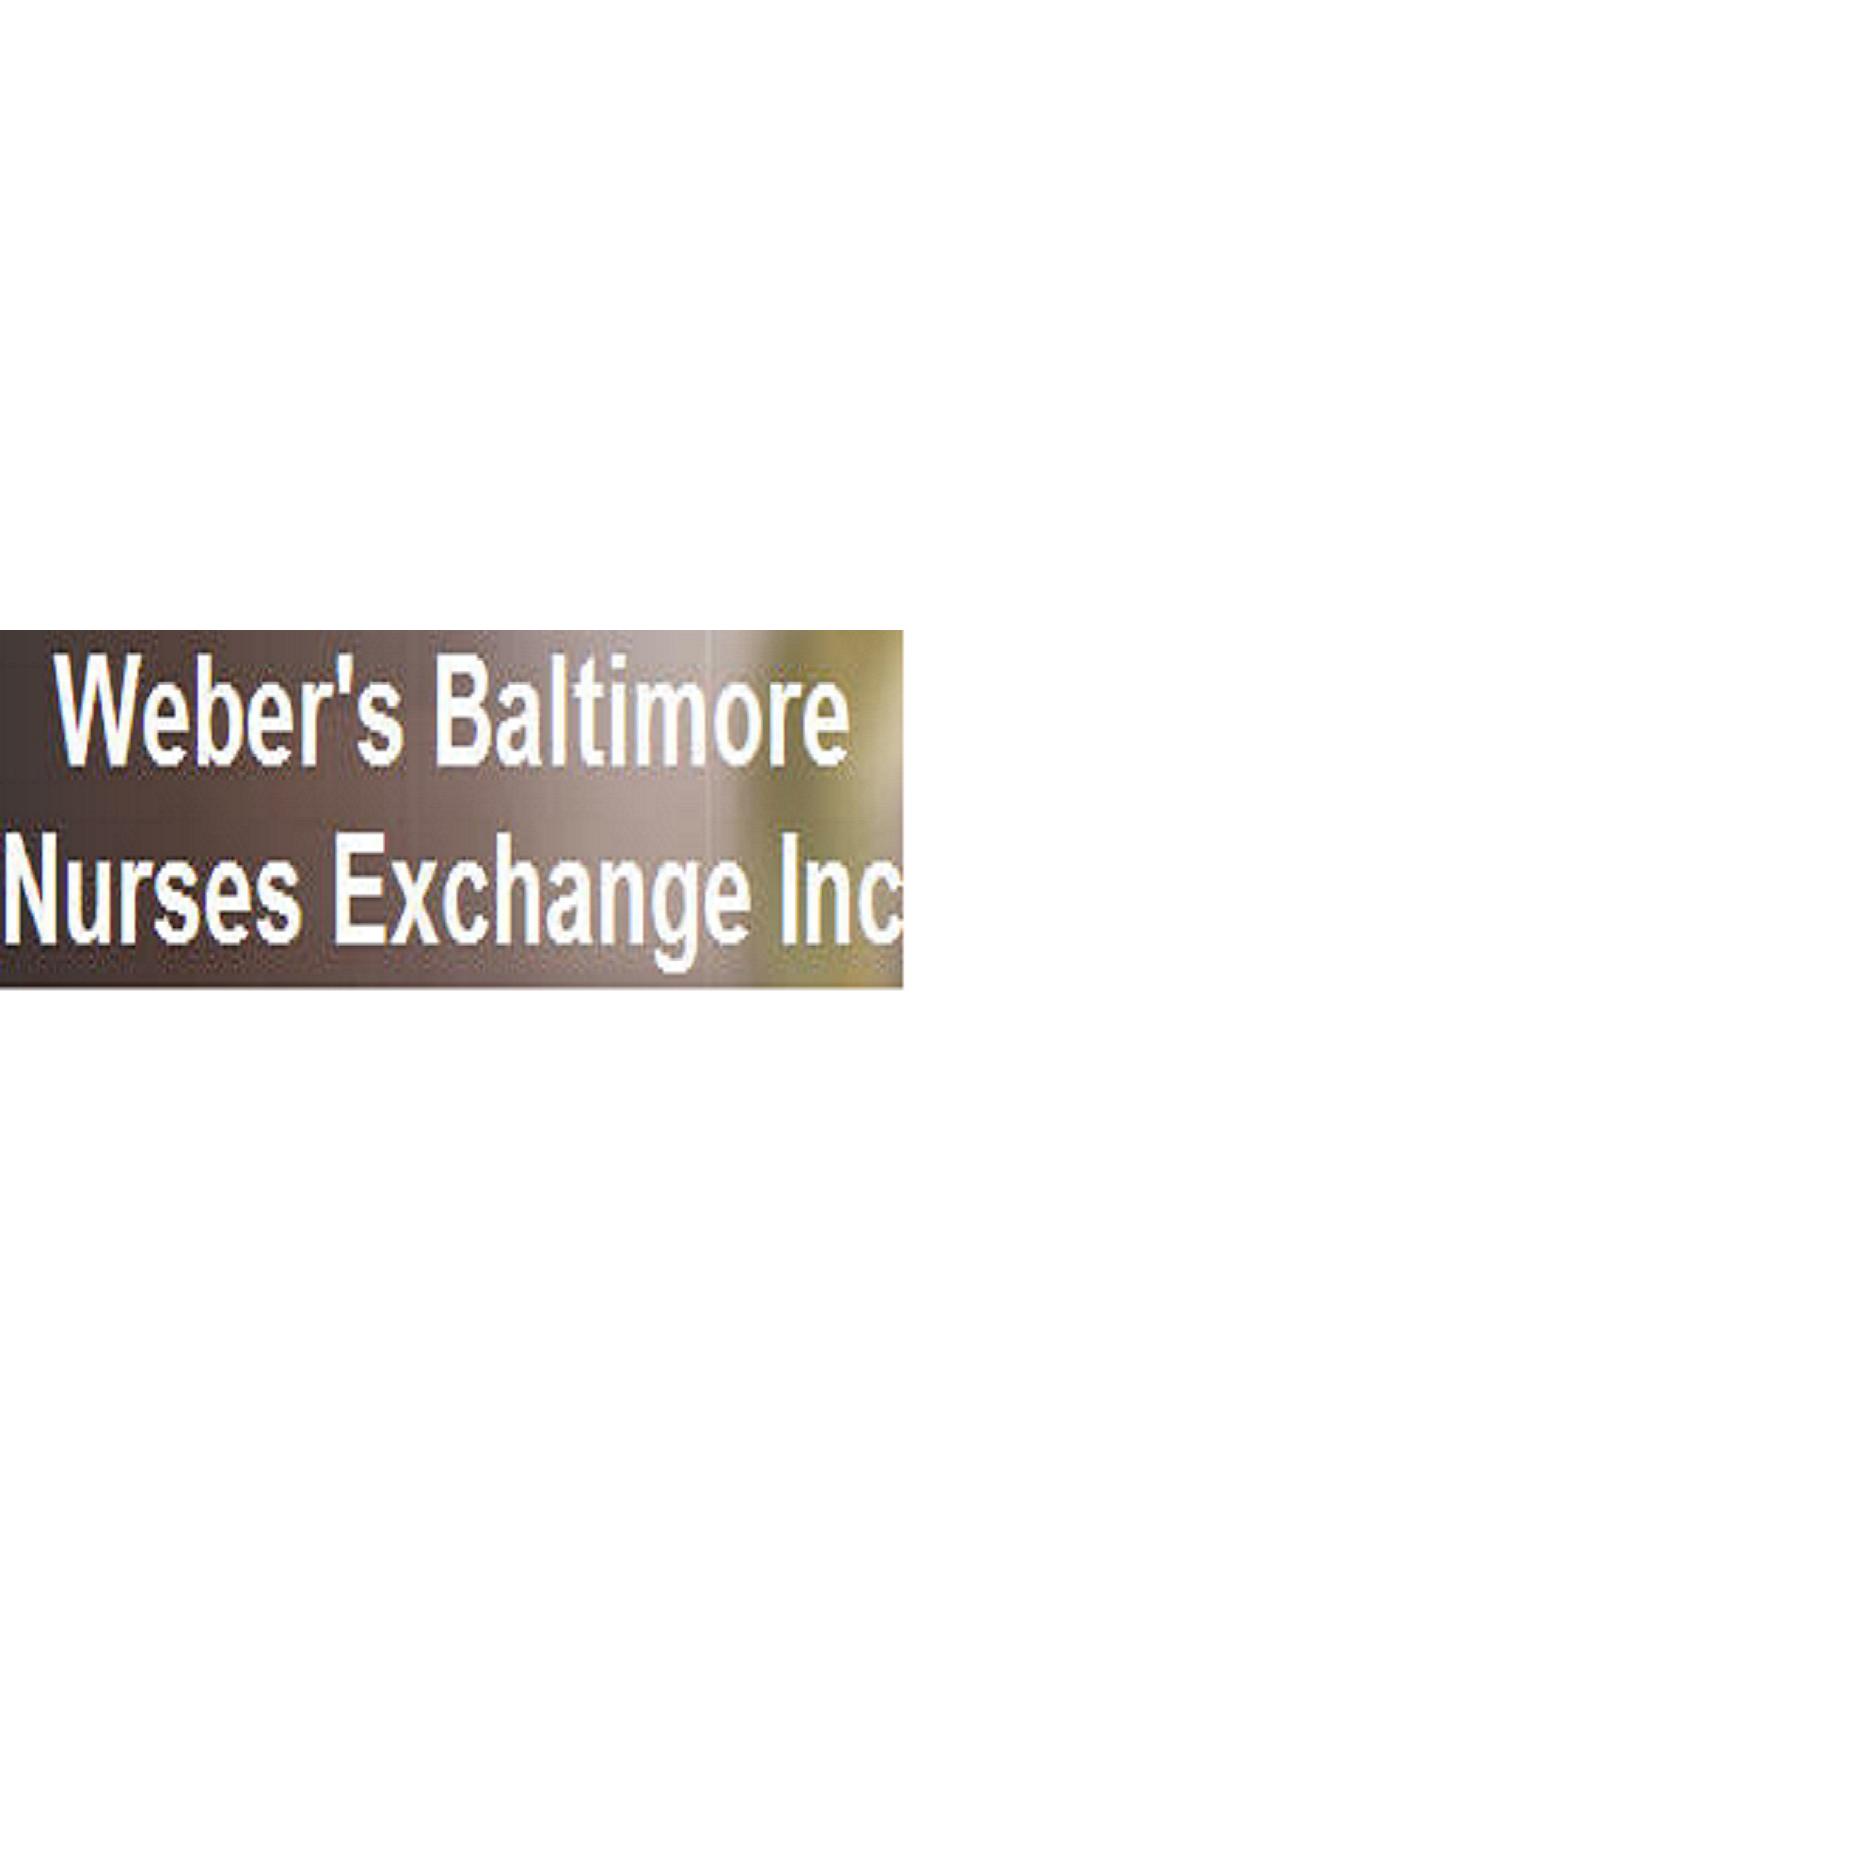 Baltimore Nurses' Exchange Inc.